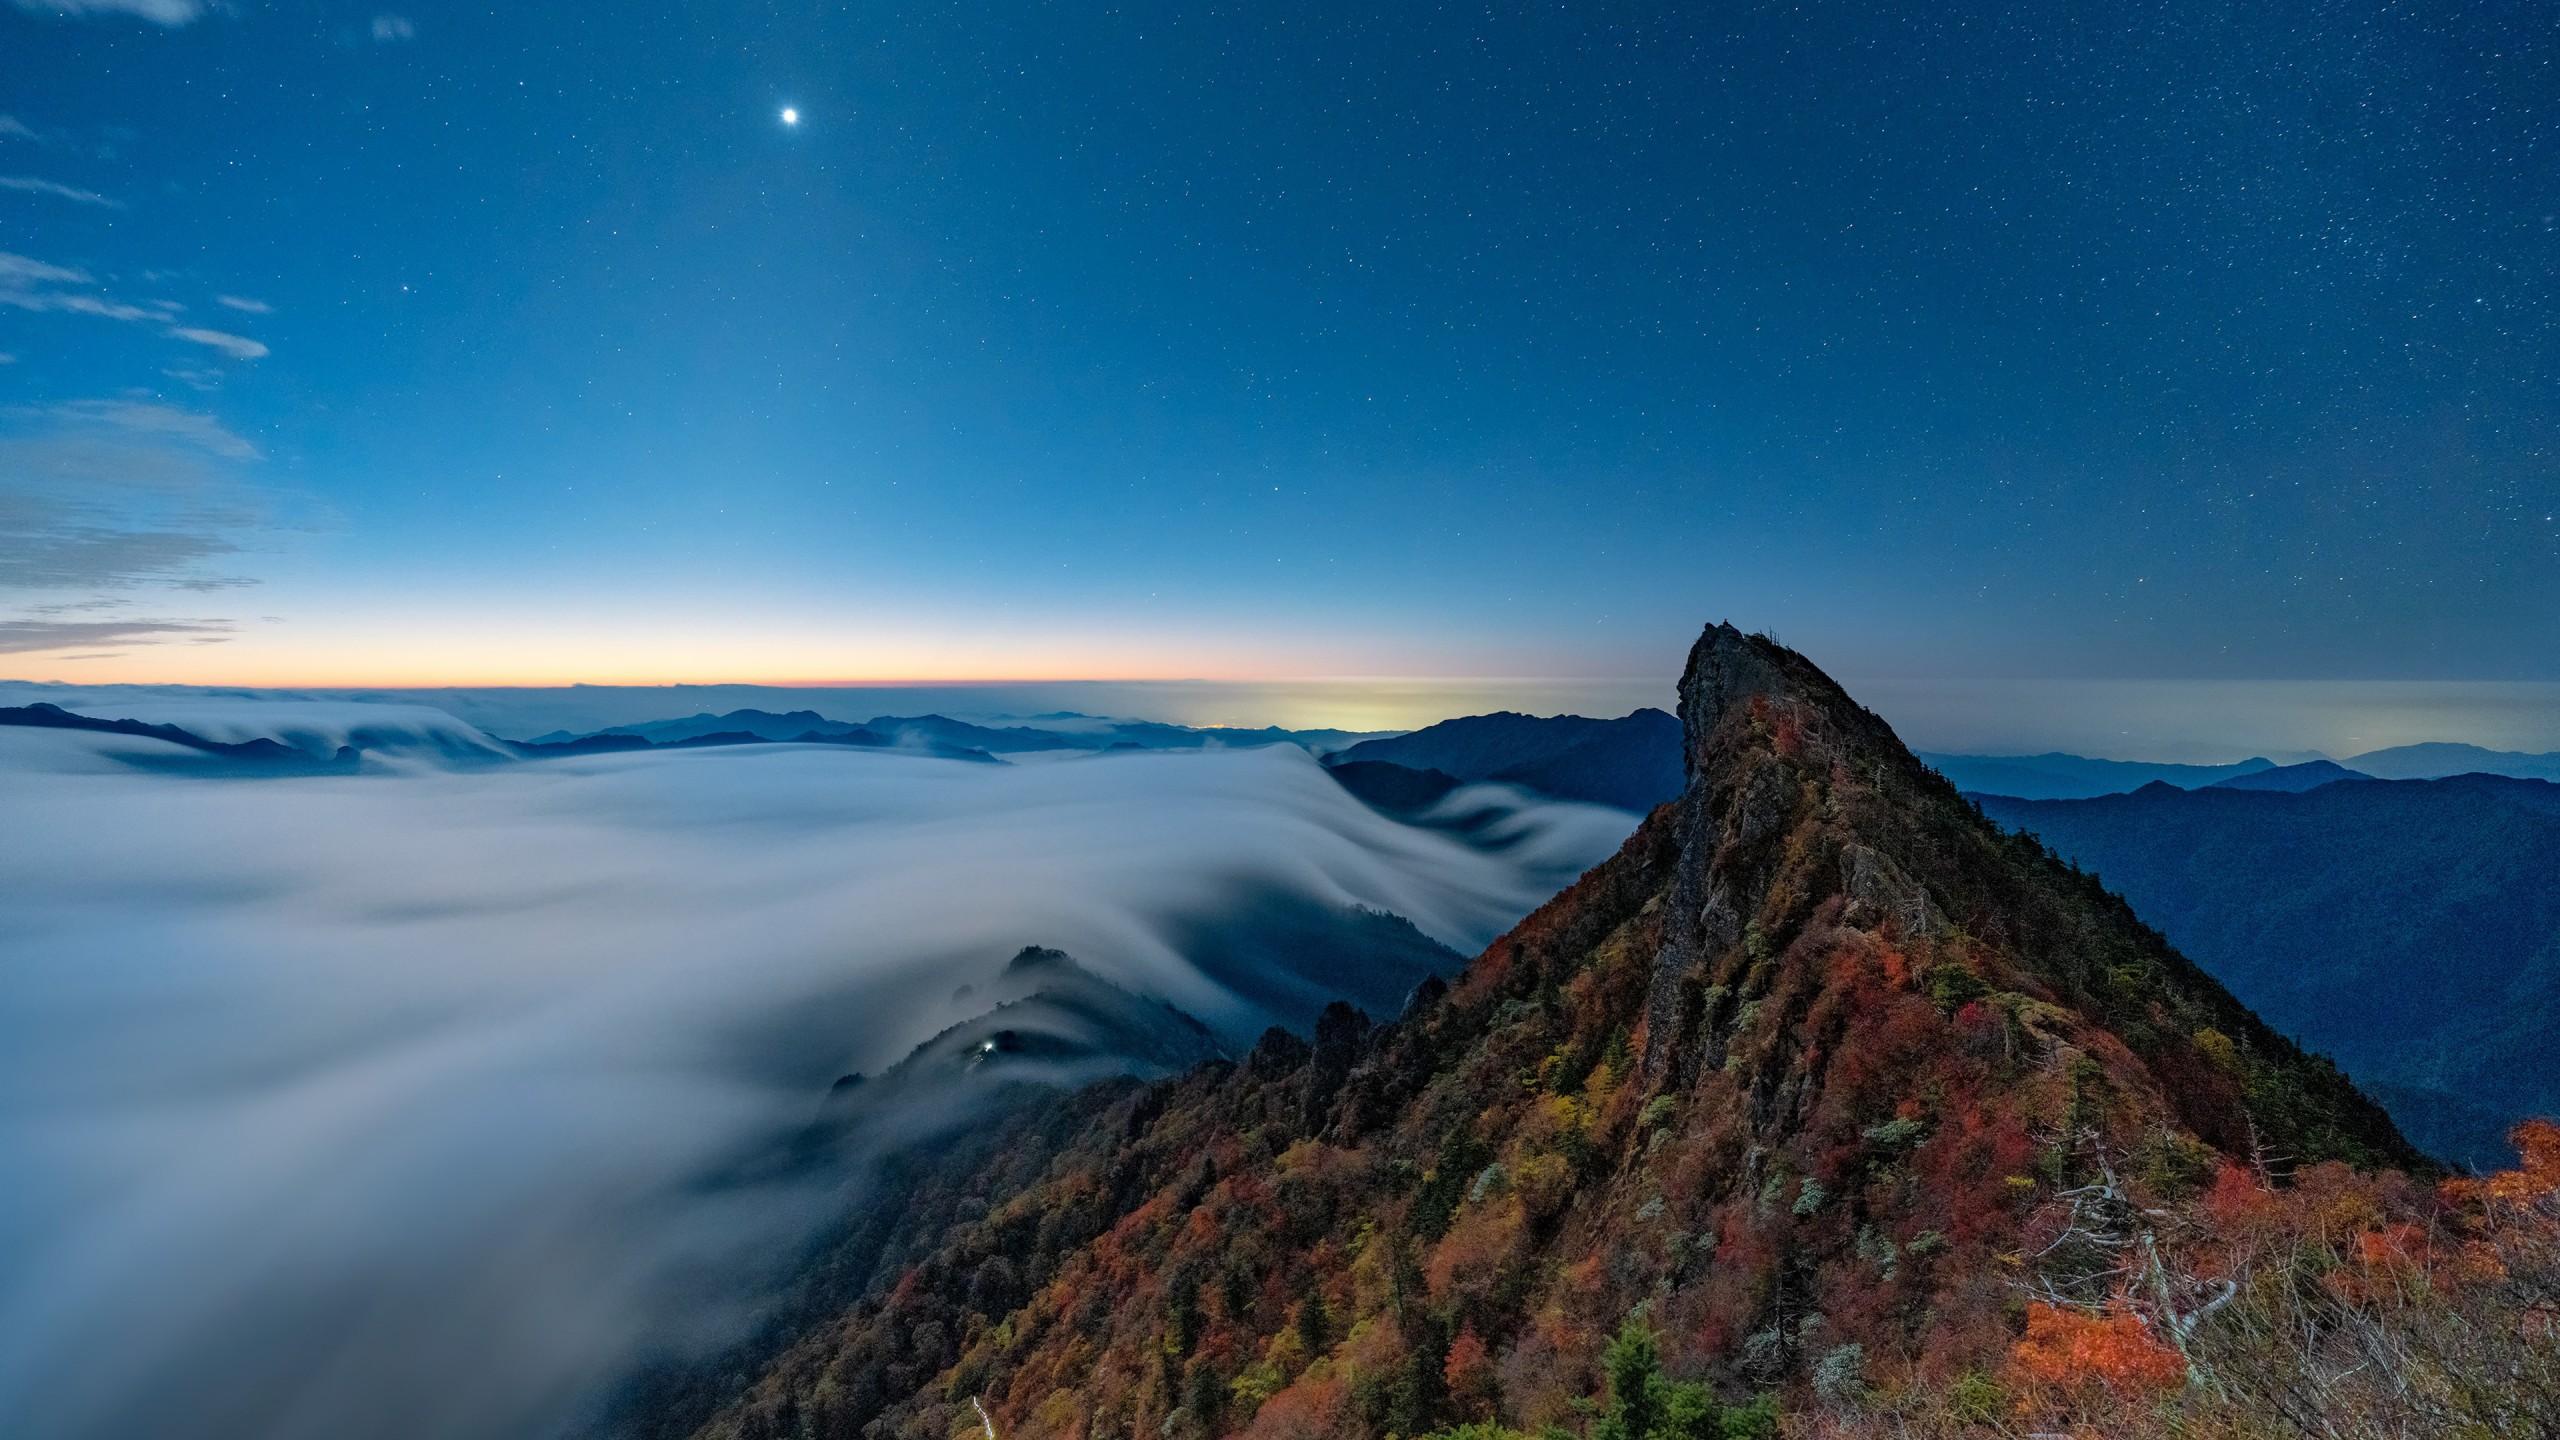 Fondos de pantalla Montaña entre niebla